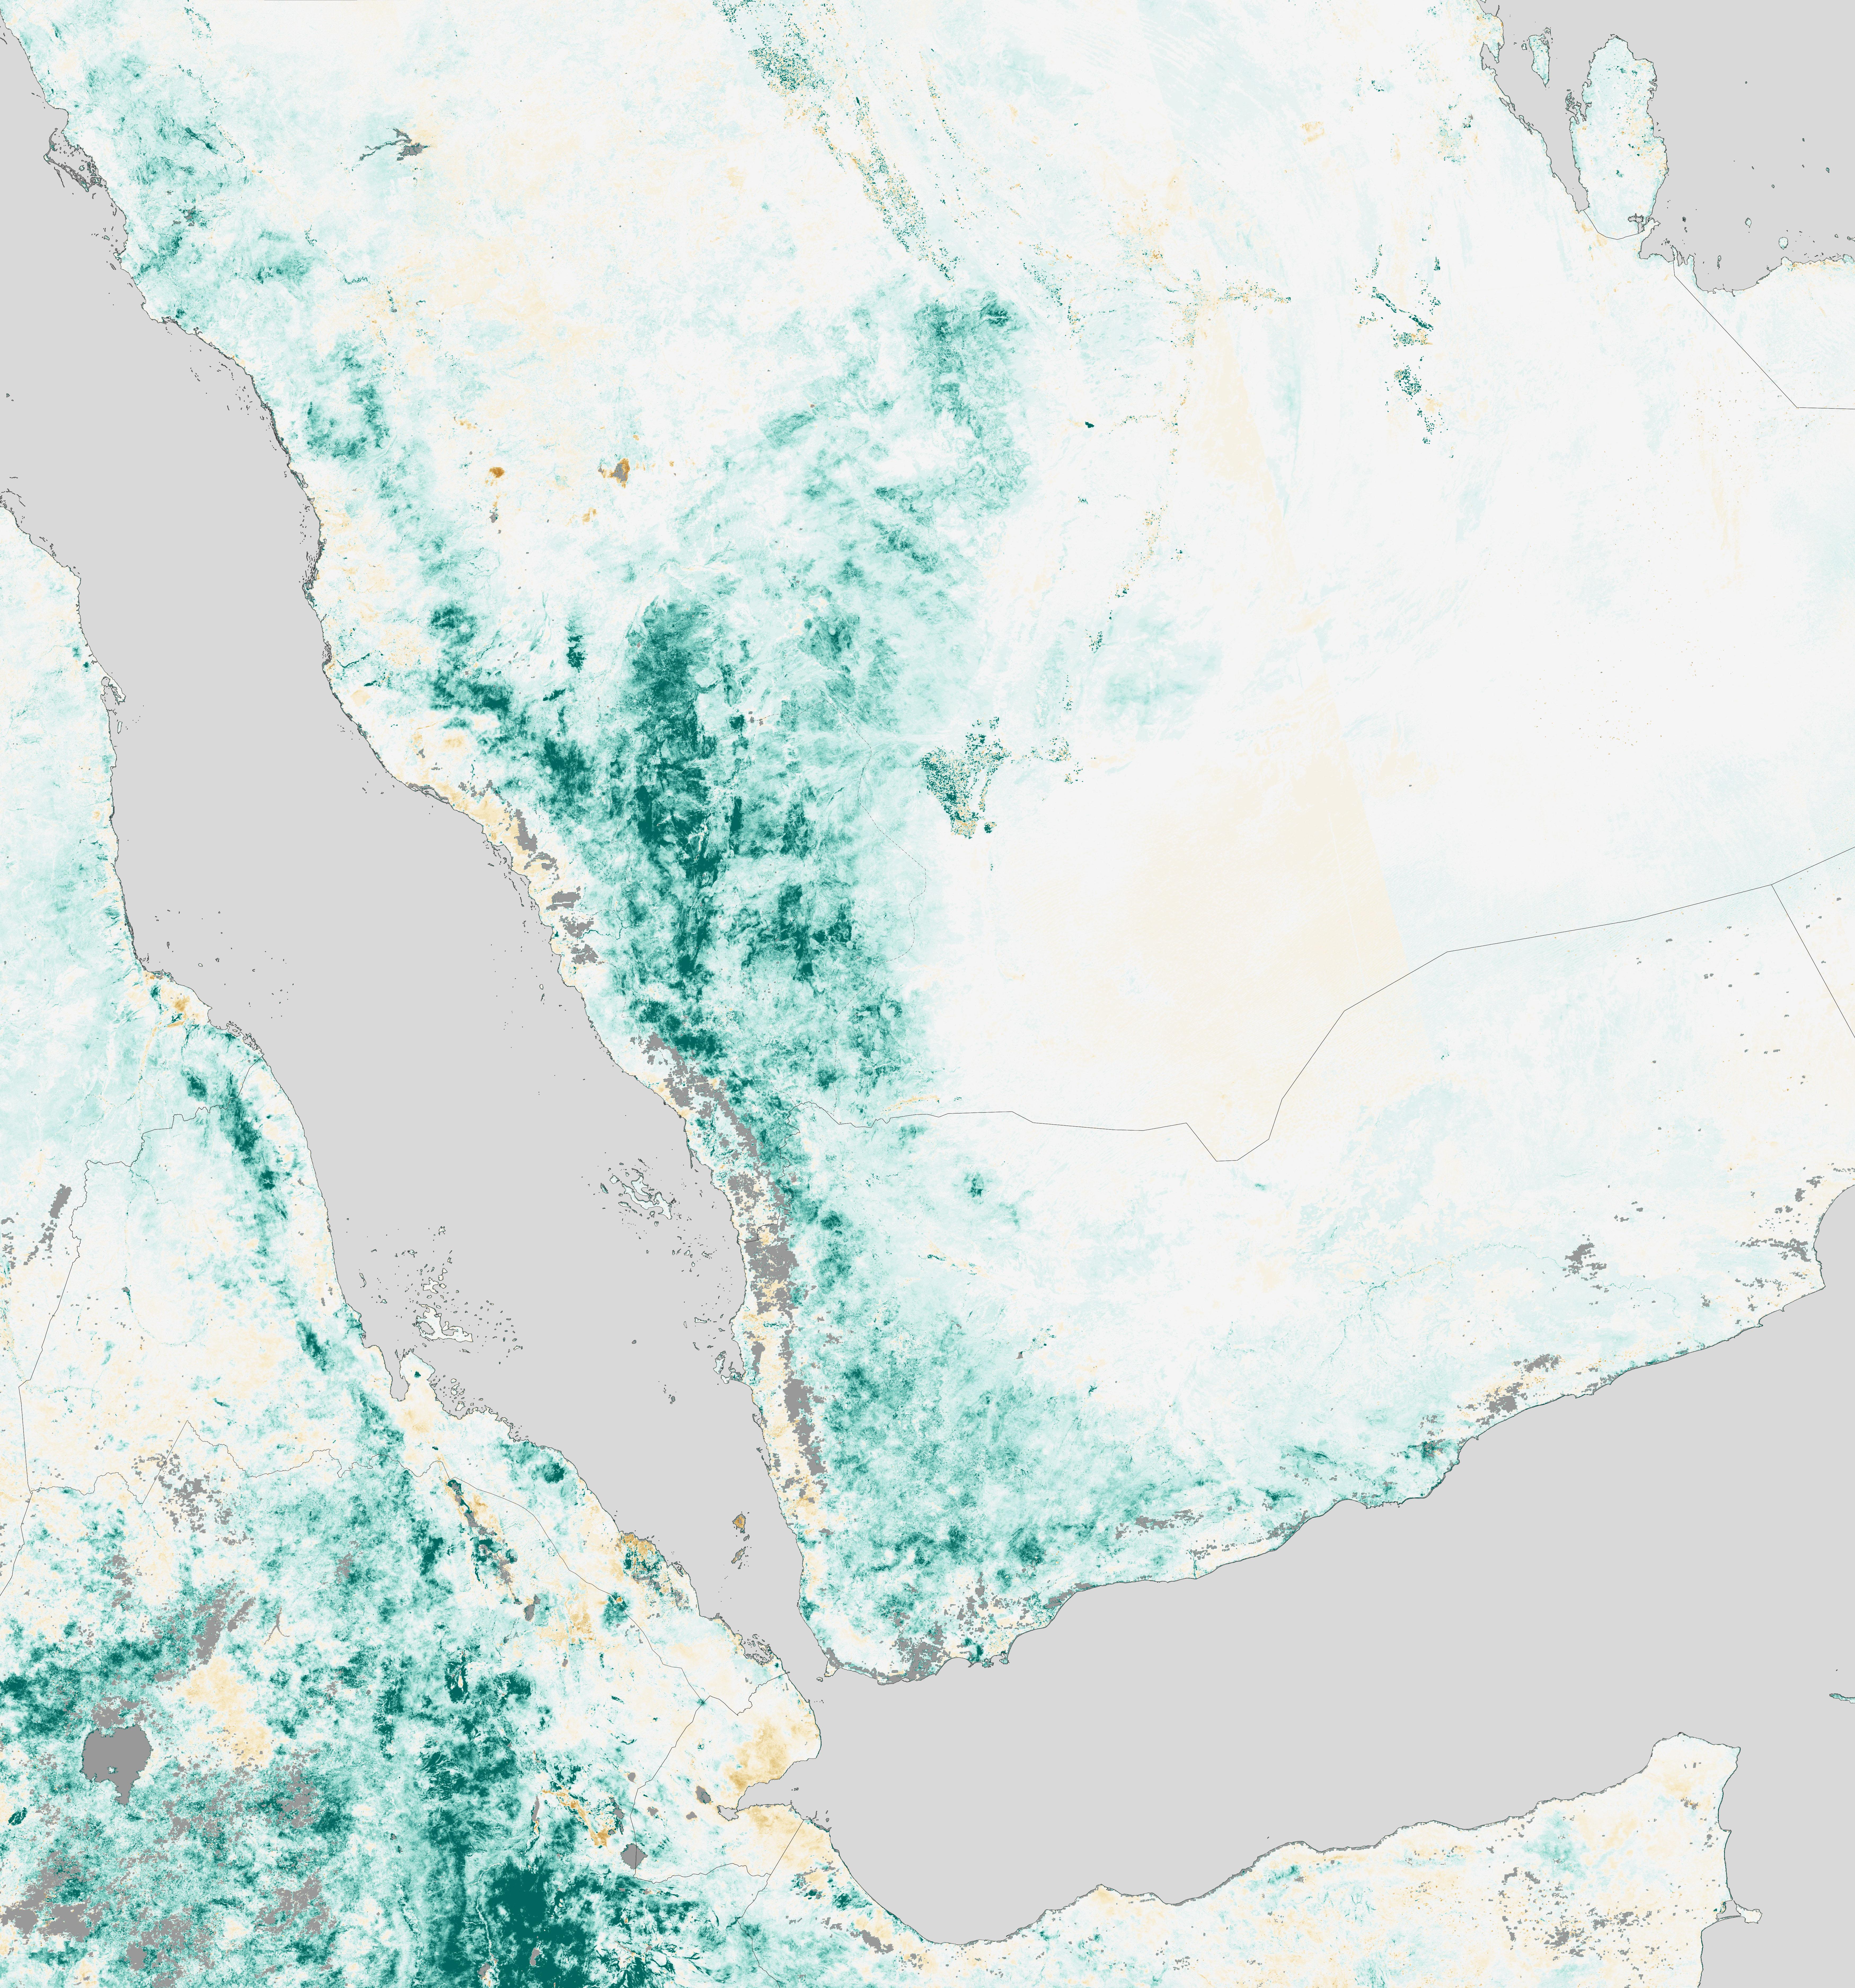 NASA Visible Earth: Arabian Peninsula Primed for Rift Valley Fever